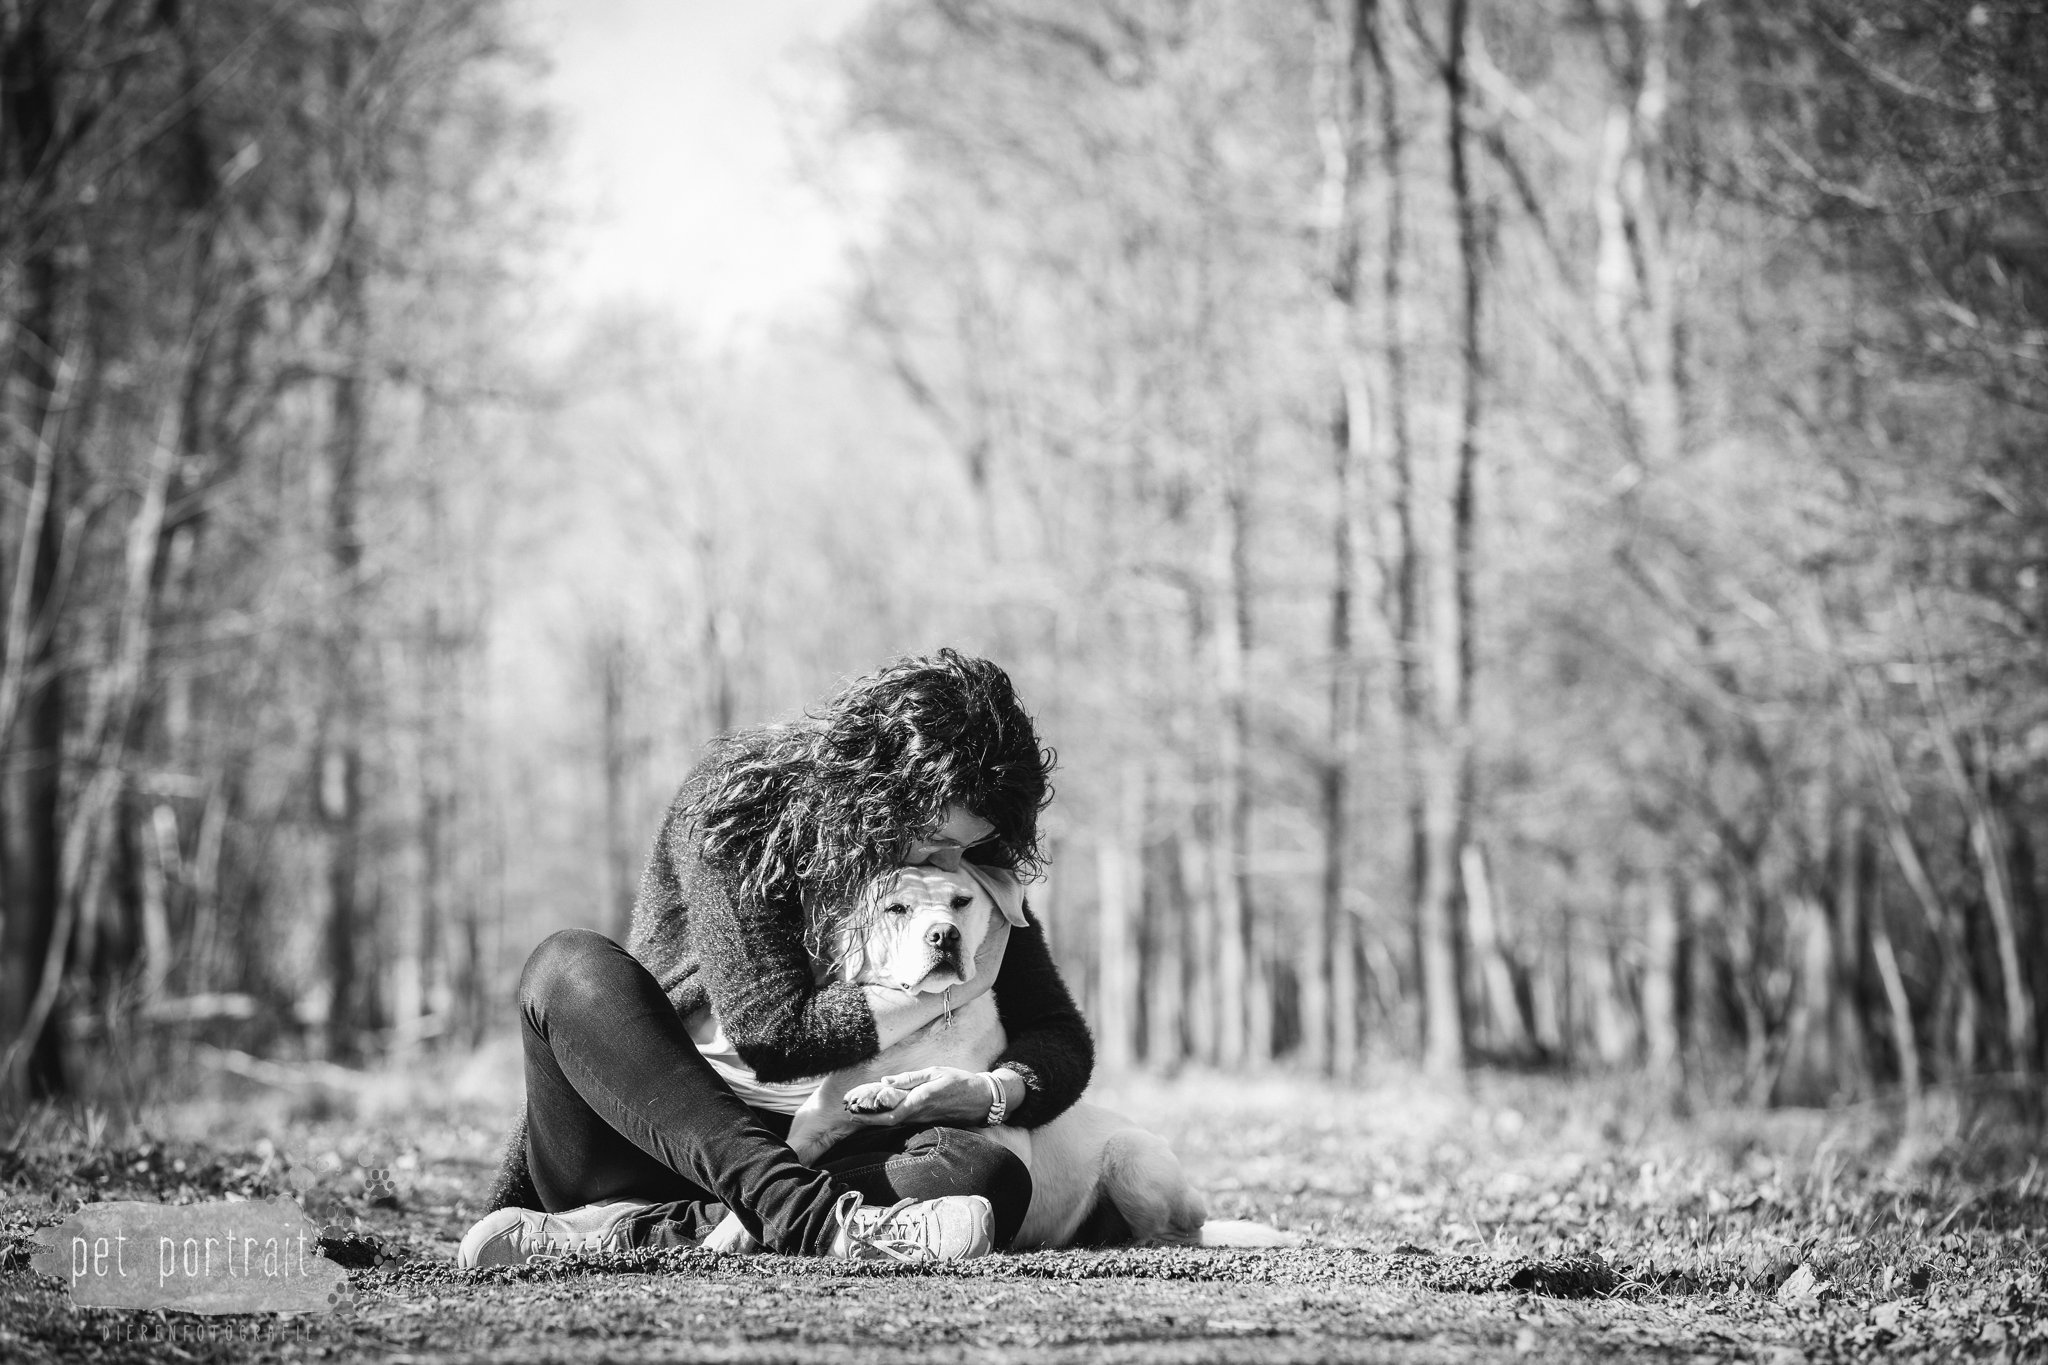 Hondenfotograaf Noordwijkerhout – Beloved Dier en Baasje fotoshoot